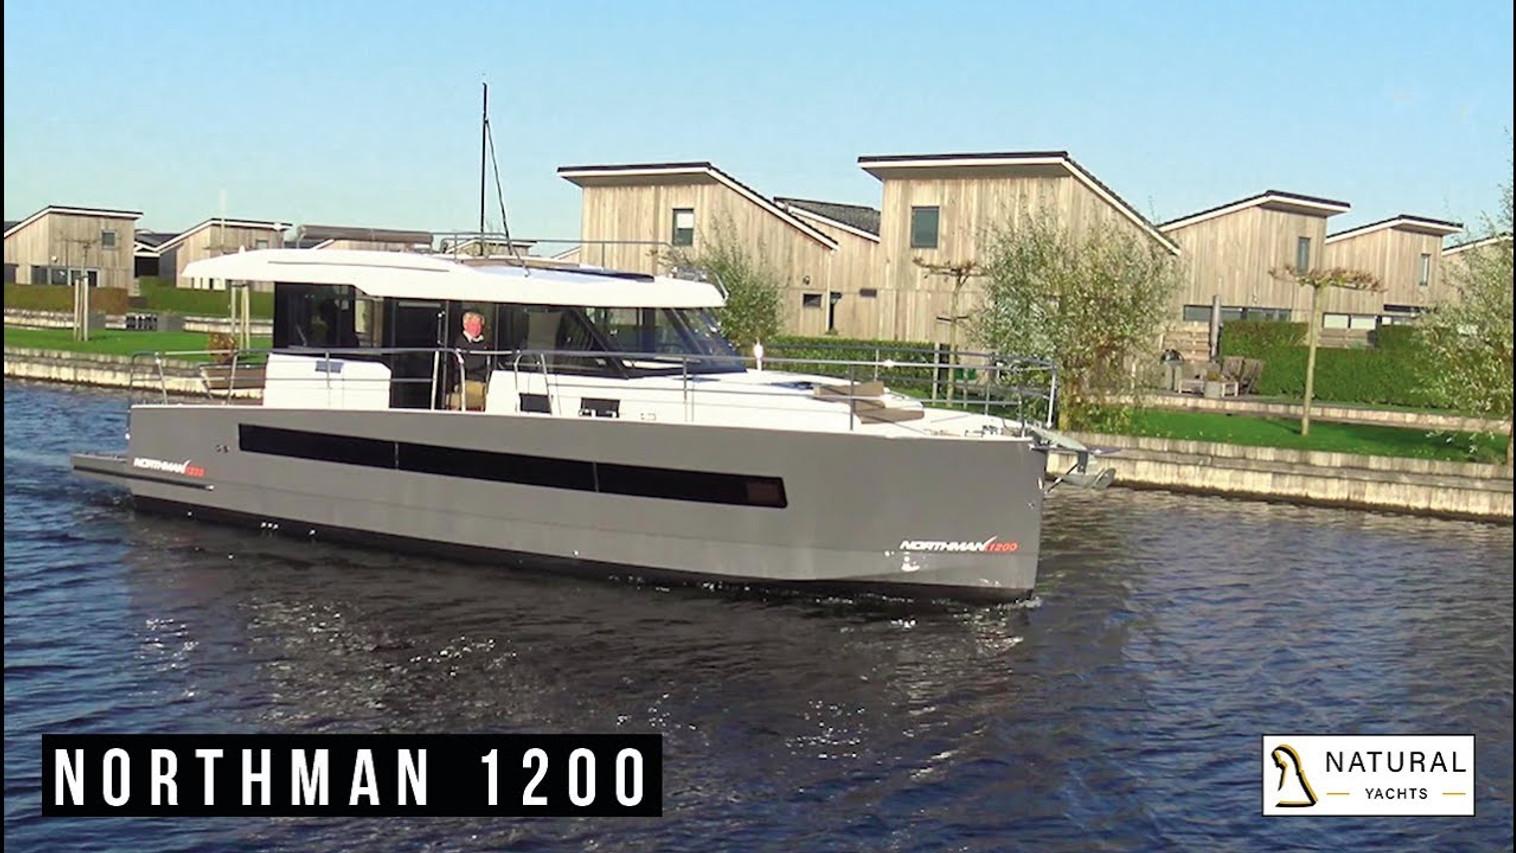 Northman 1200 Motor Yacht exterior mood video